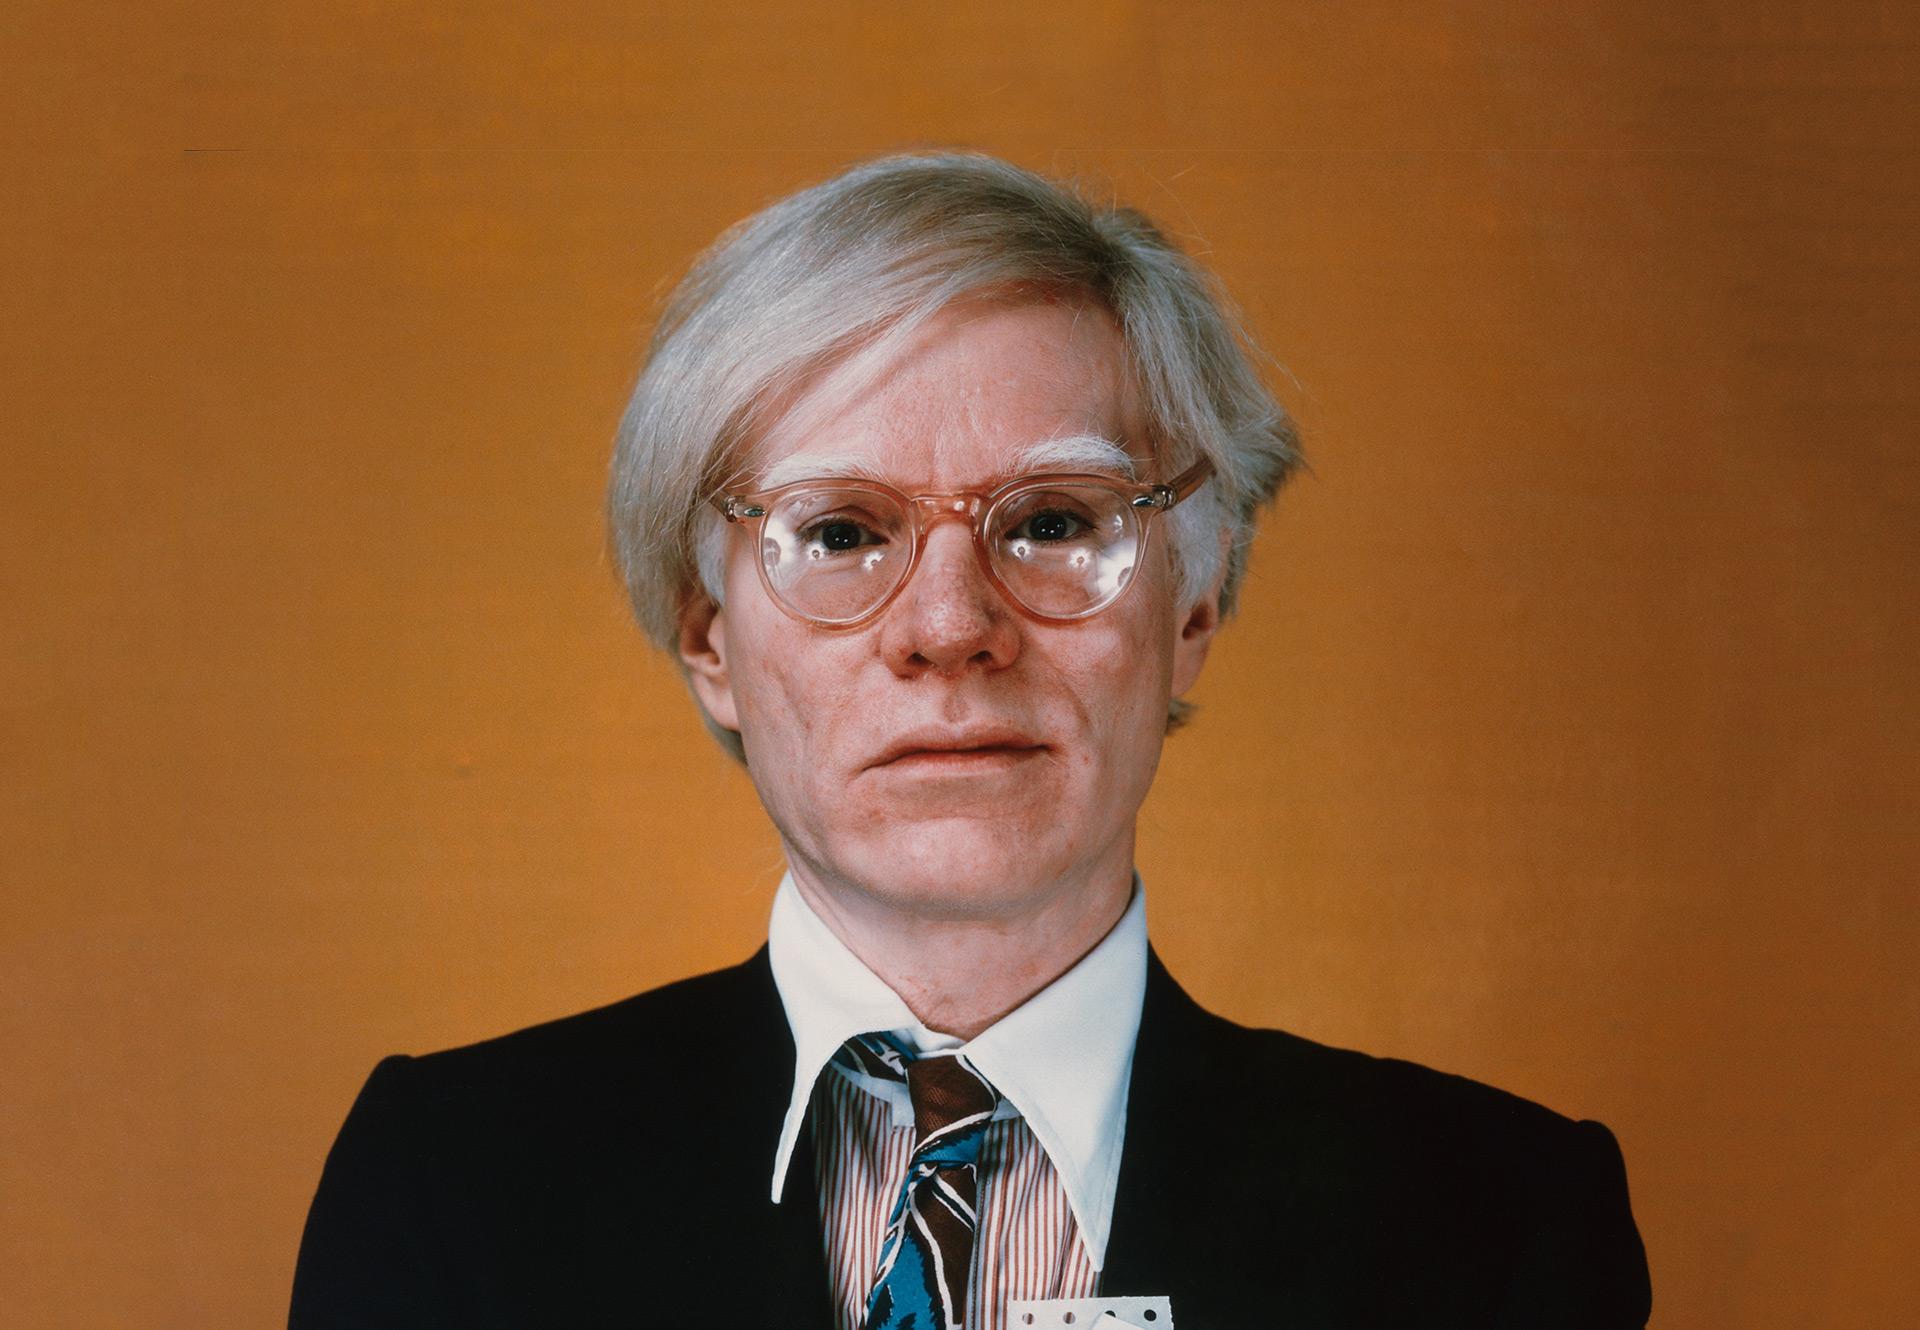 Andy Warhol | Artistas | Guggenheim Bilbao Museoa